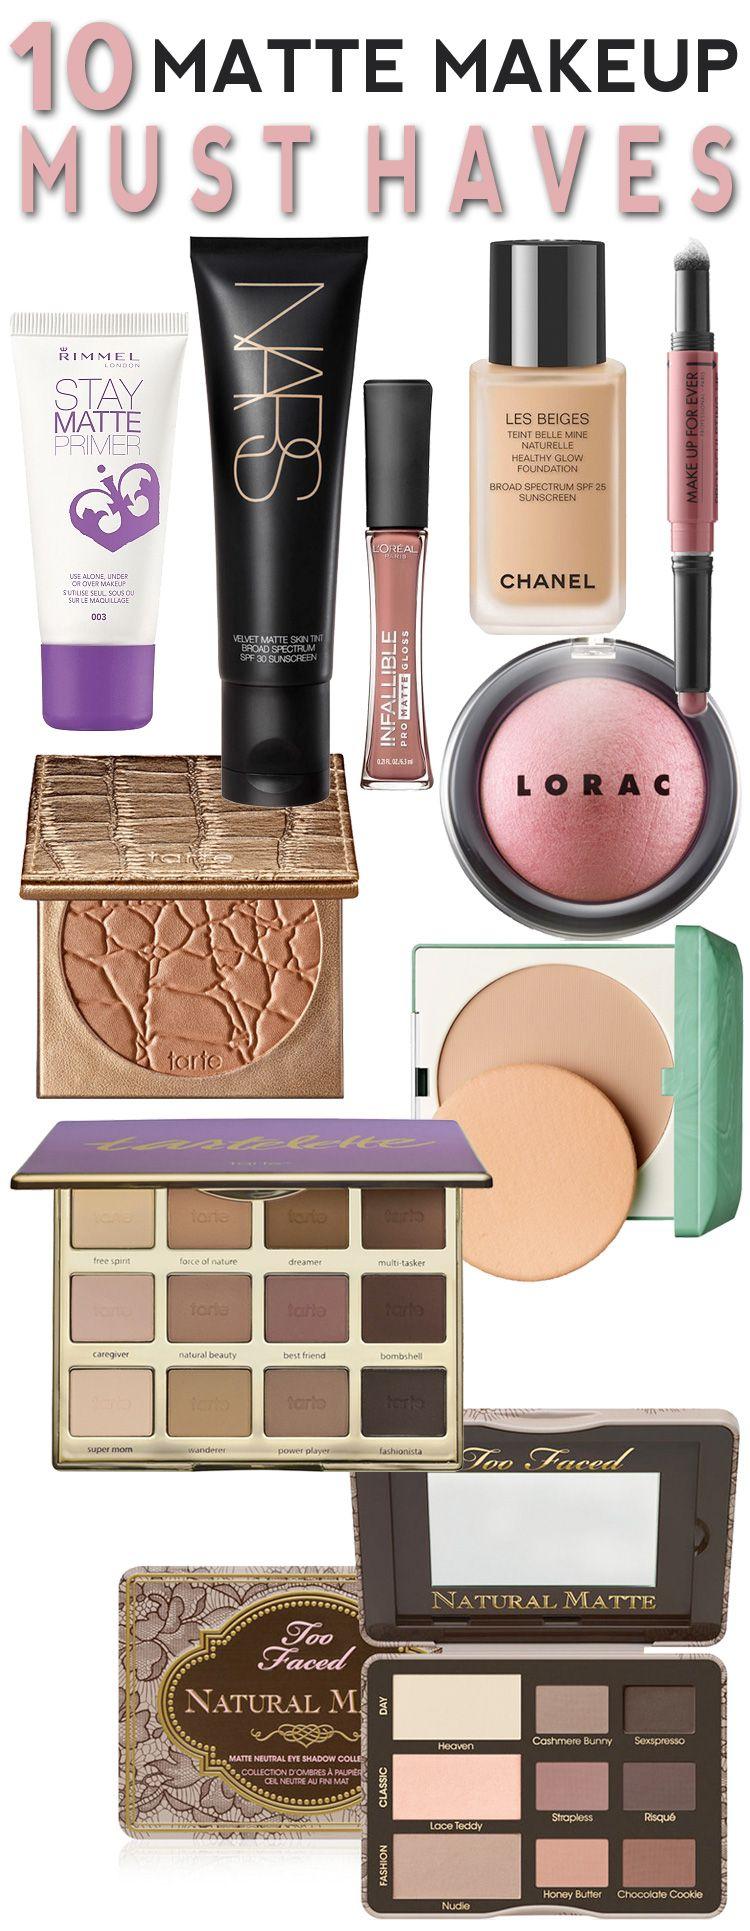 10 Matte Makeup MustHaves. Matte makeup, Makeup must